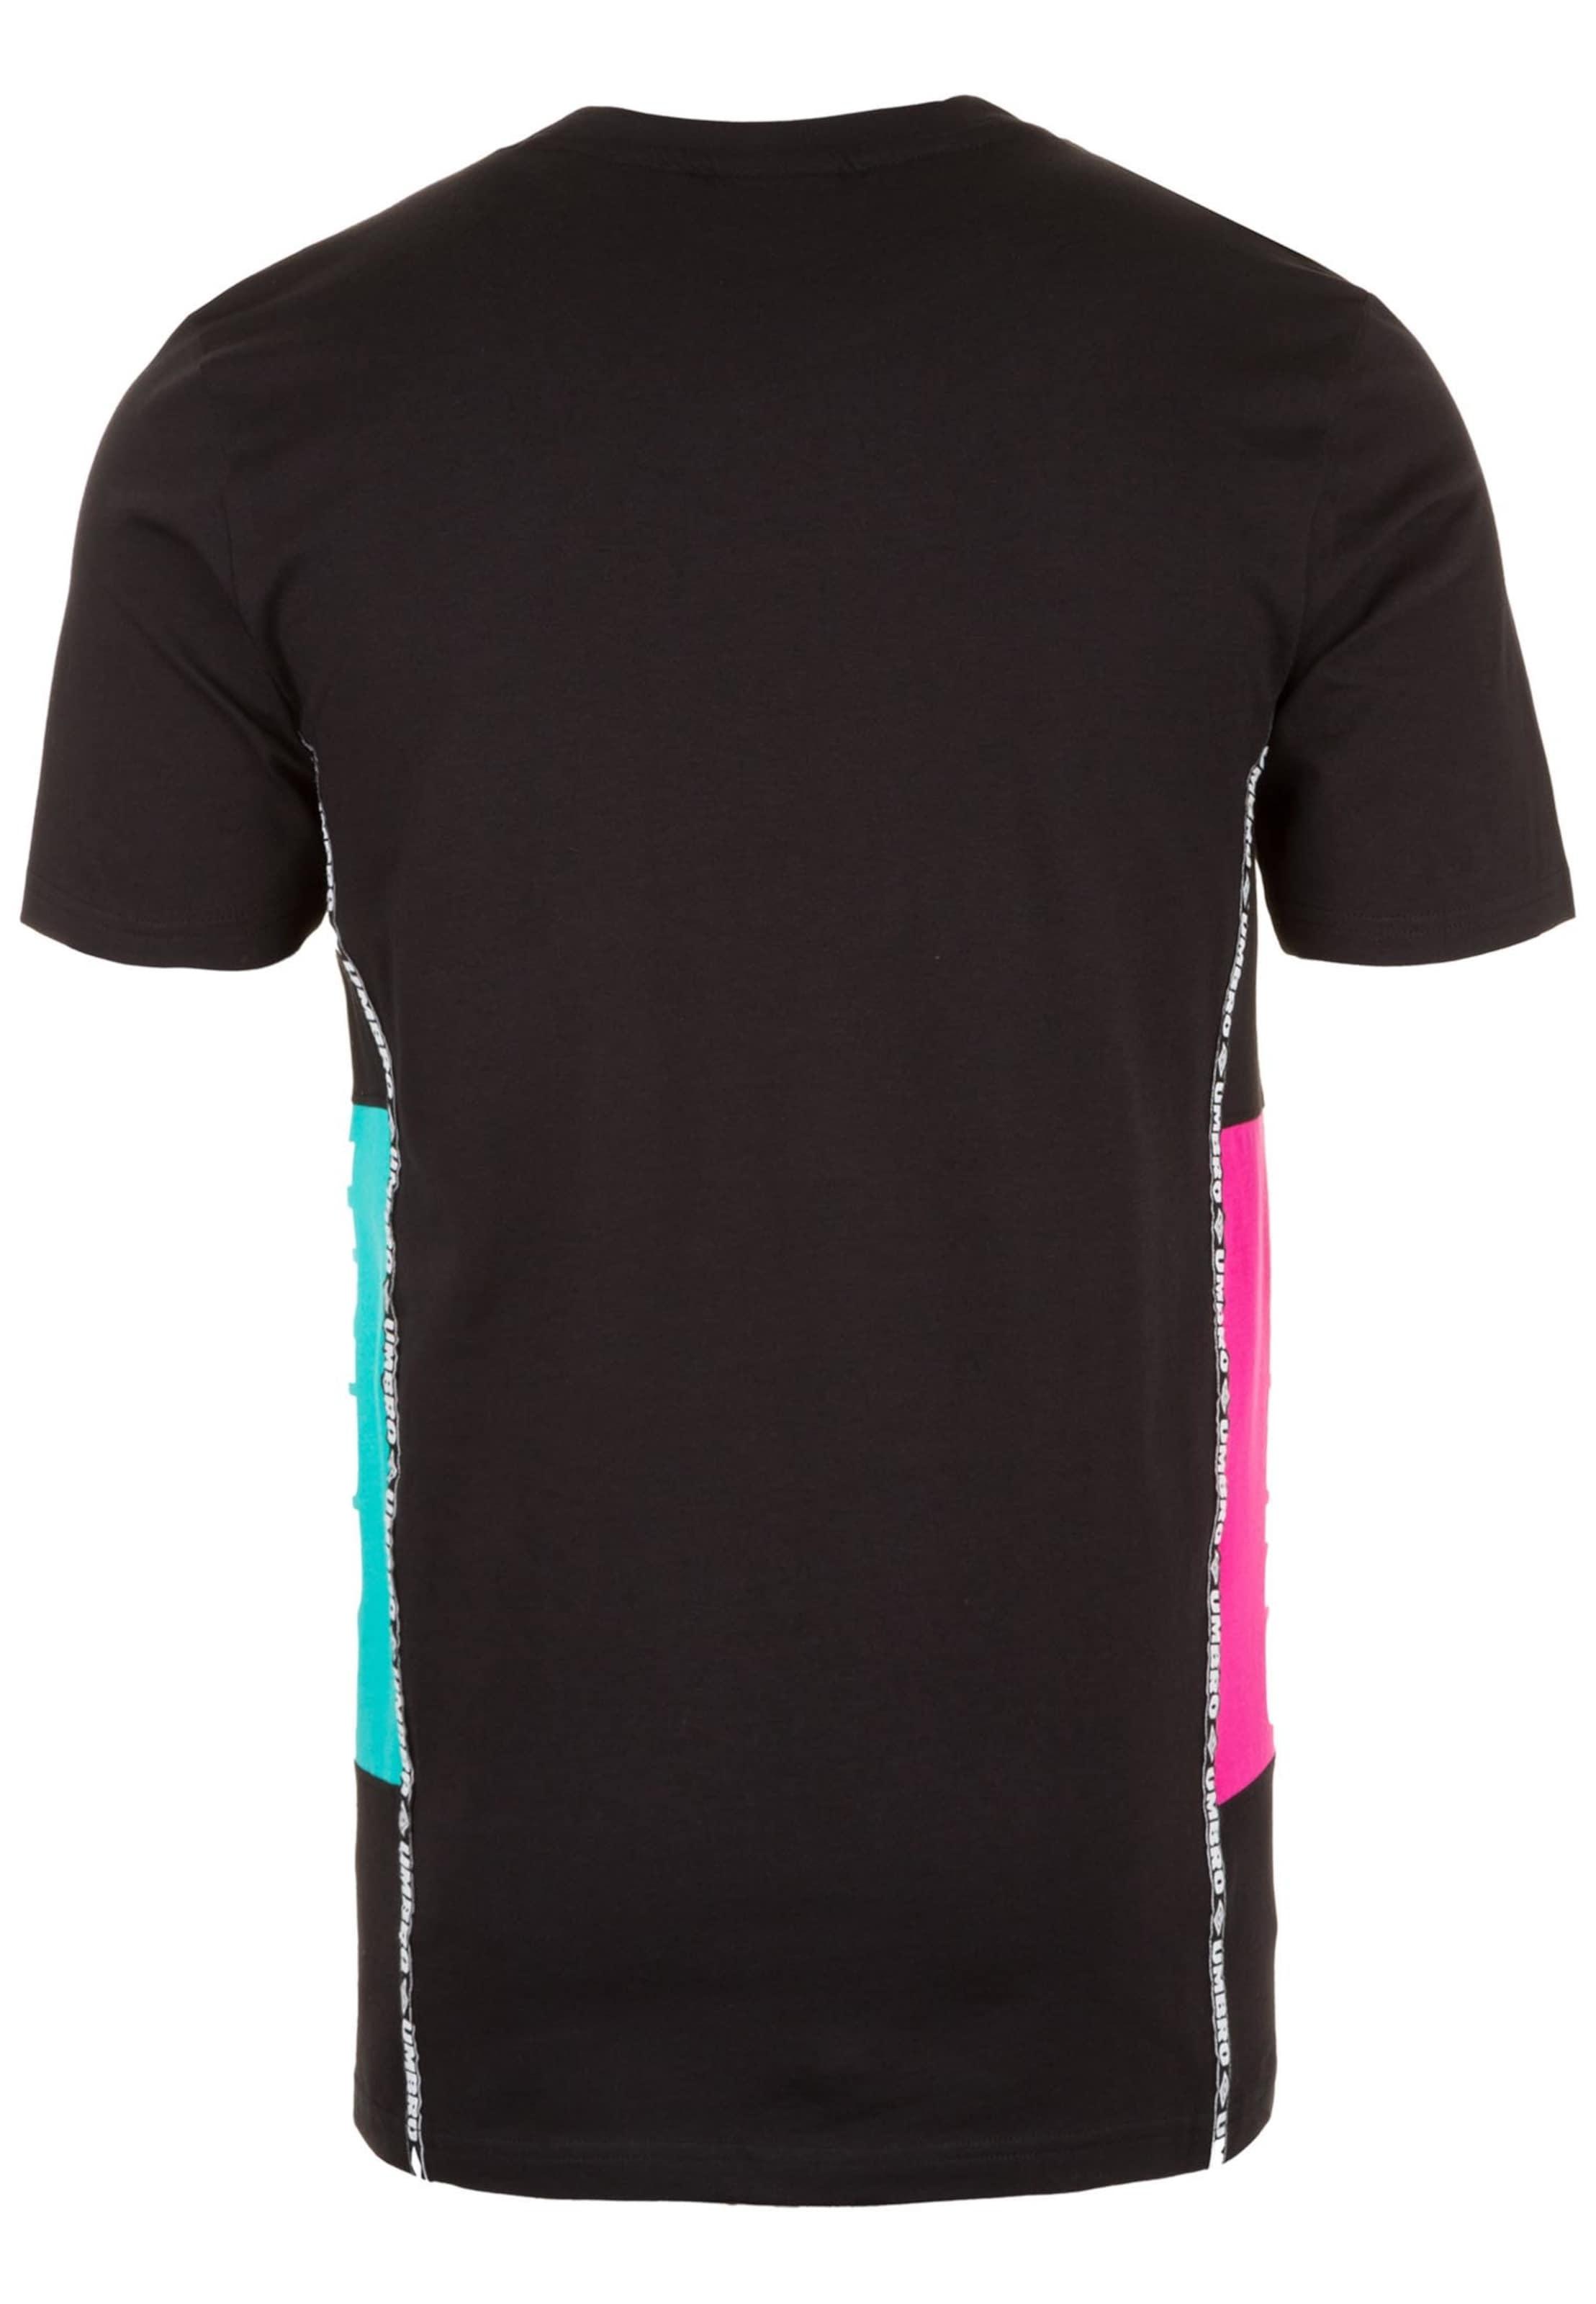 Schwarz TürkisNeonpink Umbro In shirt T 9DHE2I